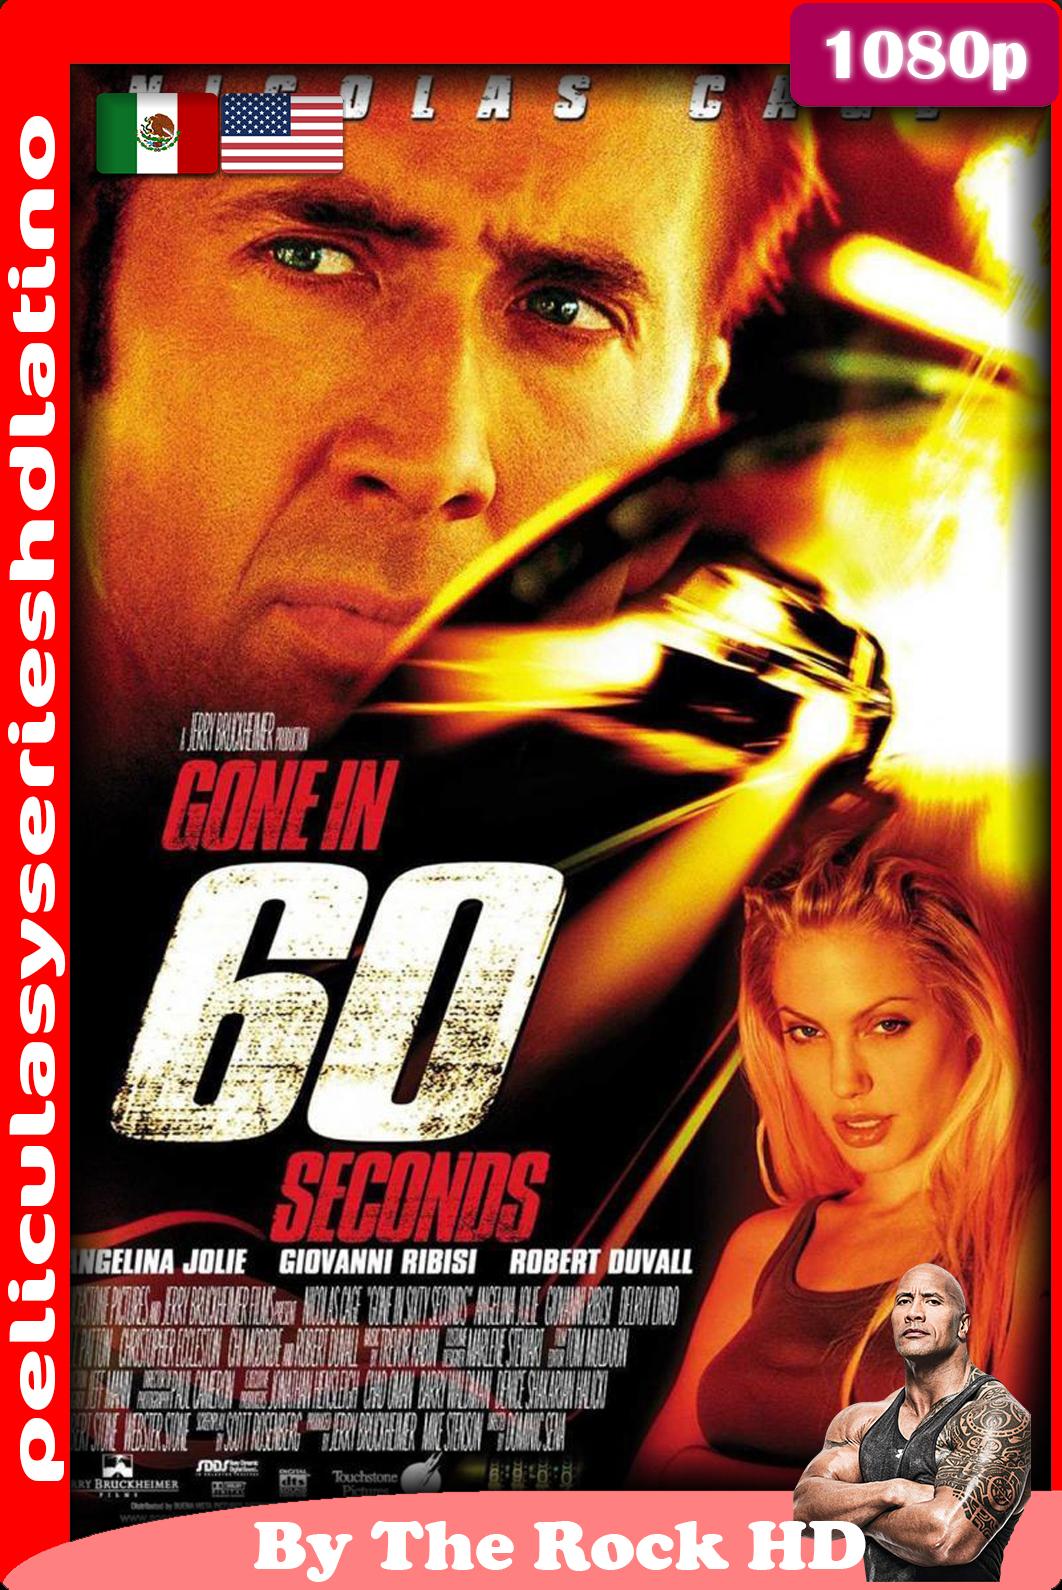 60 Segundos, (2000)[1080p] [Dual Latino] [Google Drive]